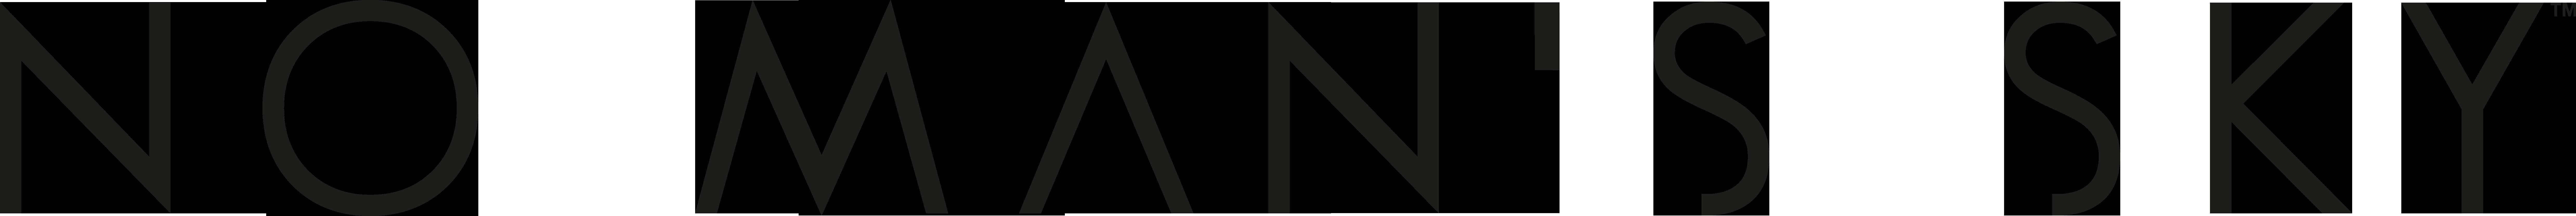 NMS_Logo__black_1445969452